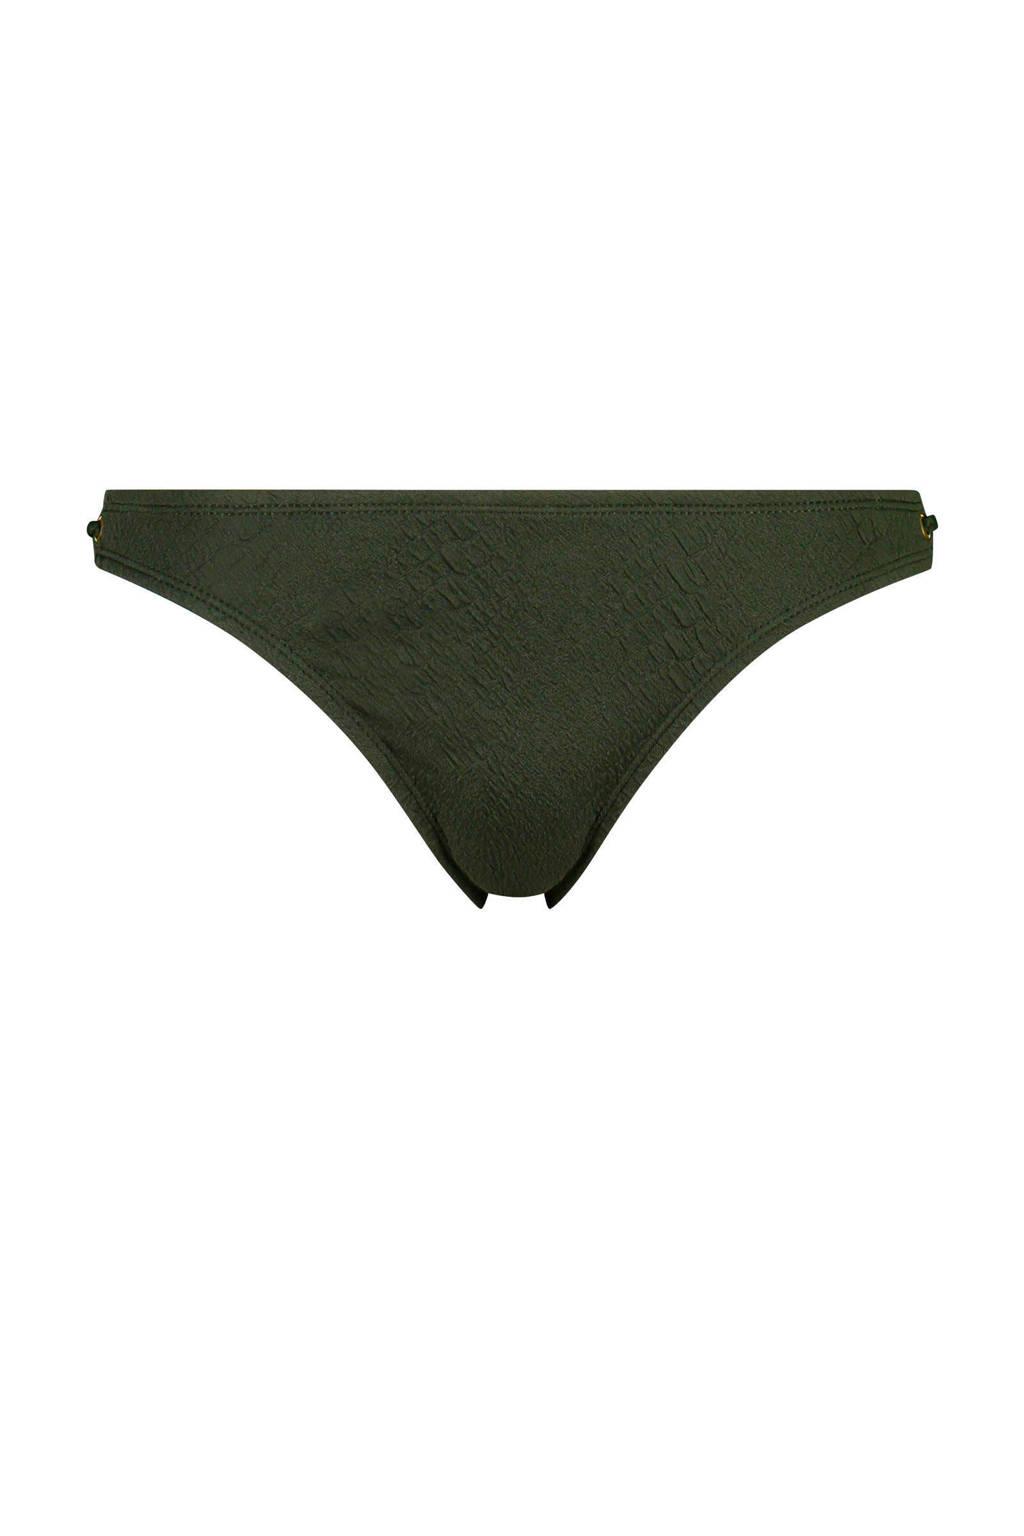 Hunkemöller Mix & Match bikinibroekje Amazonia met jacquard patroon kaki, Groen